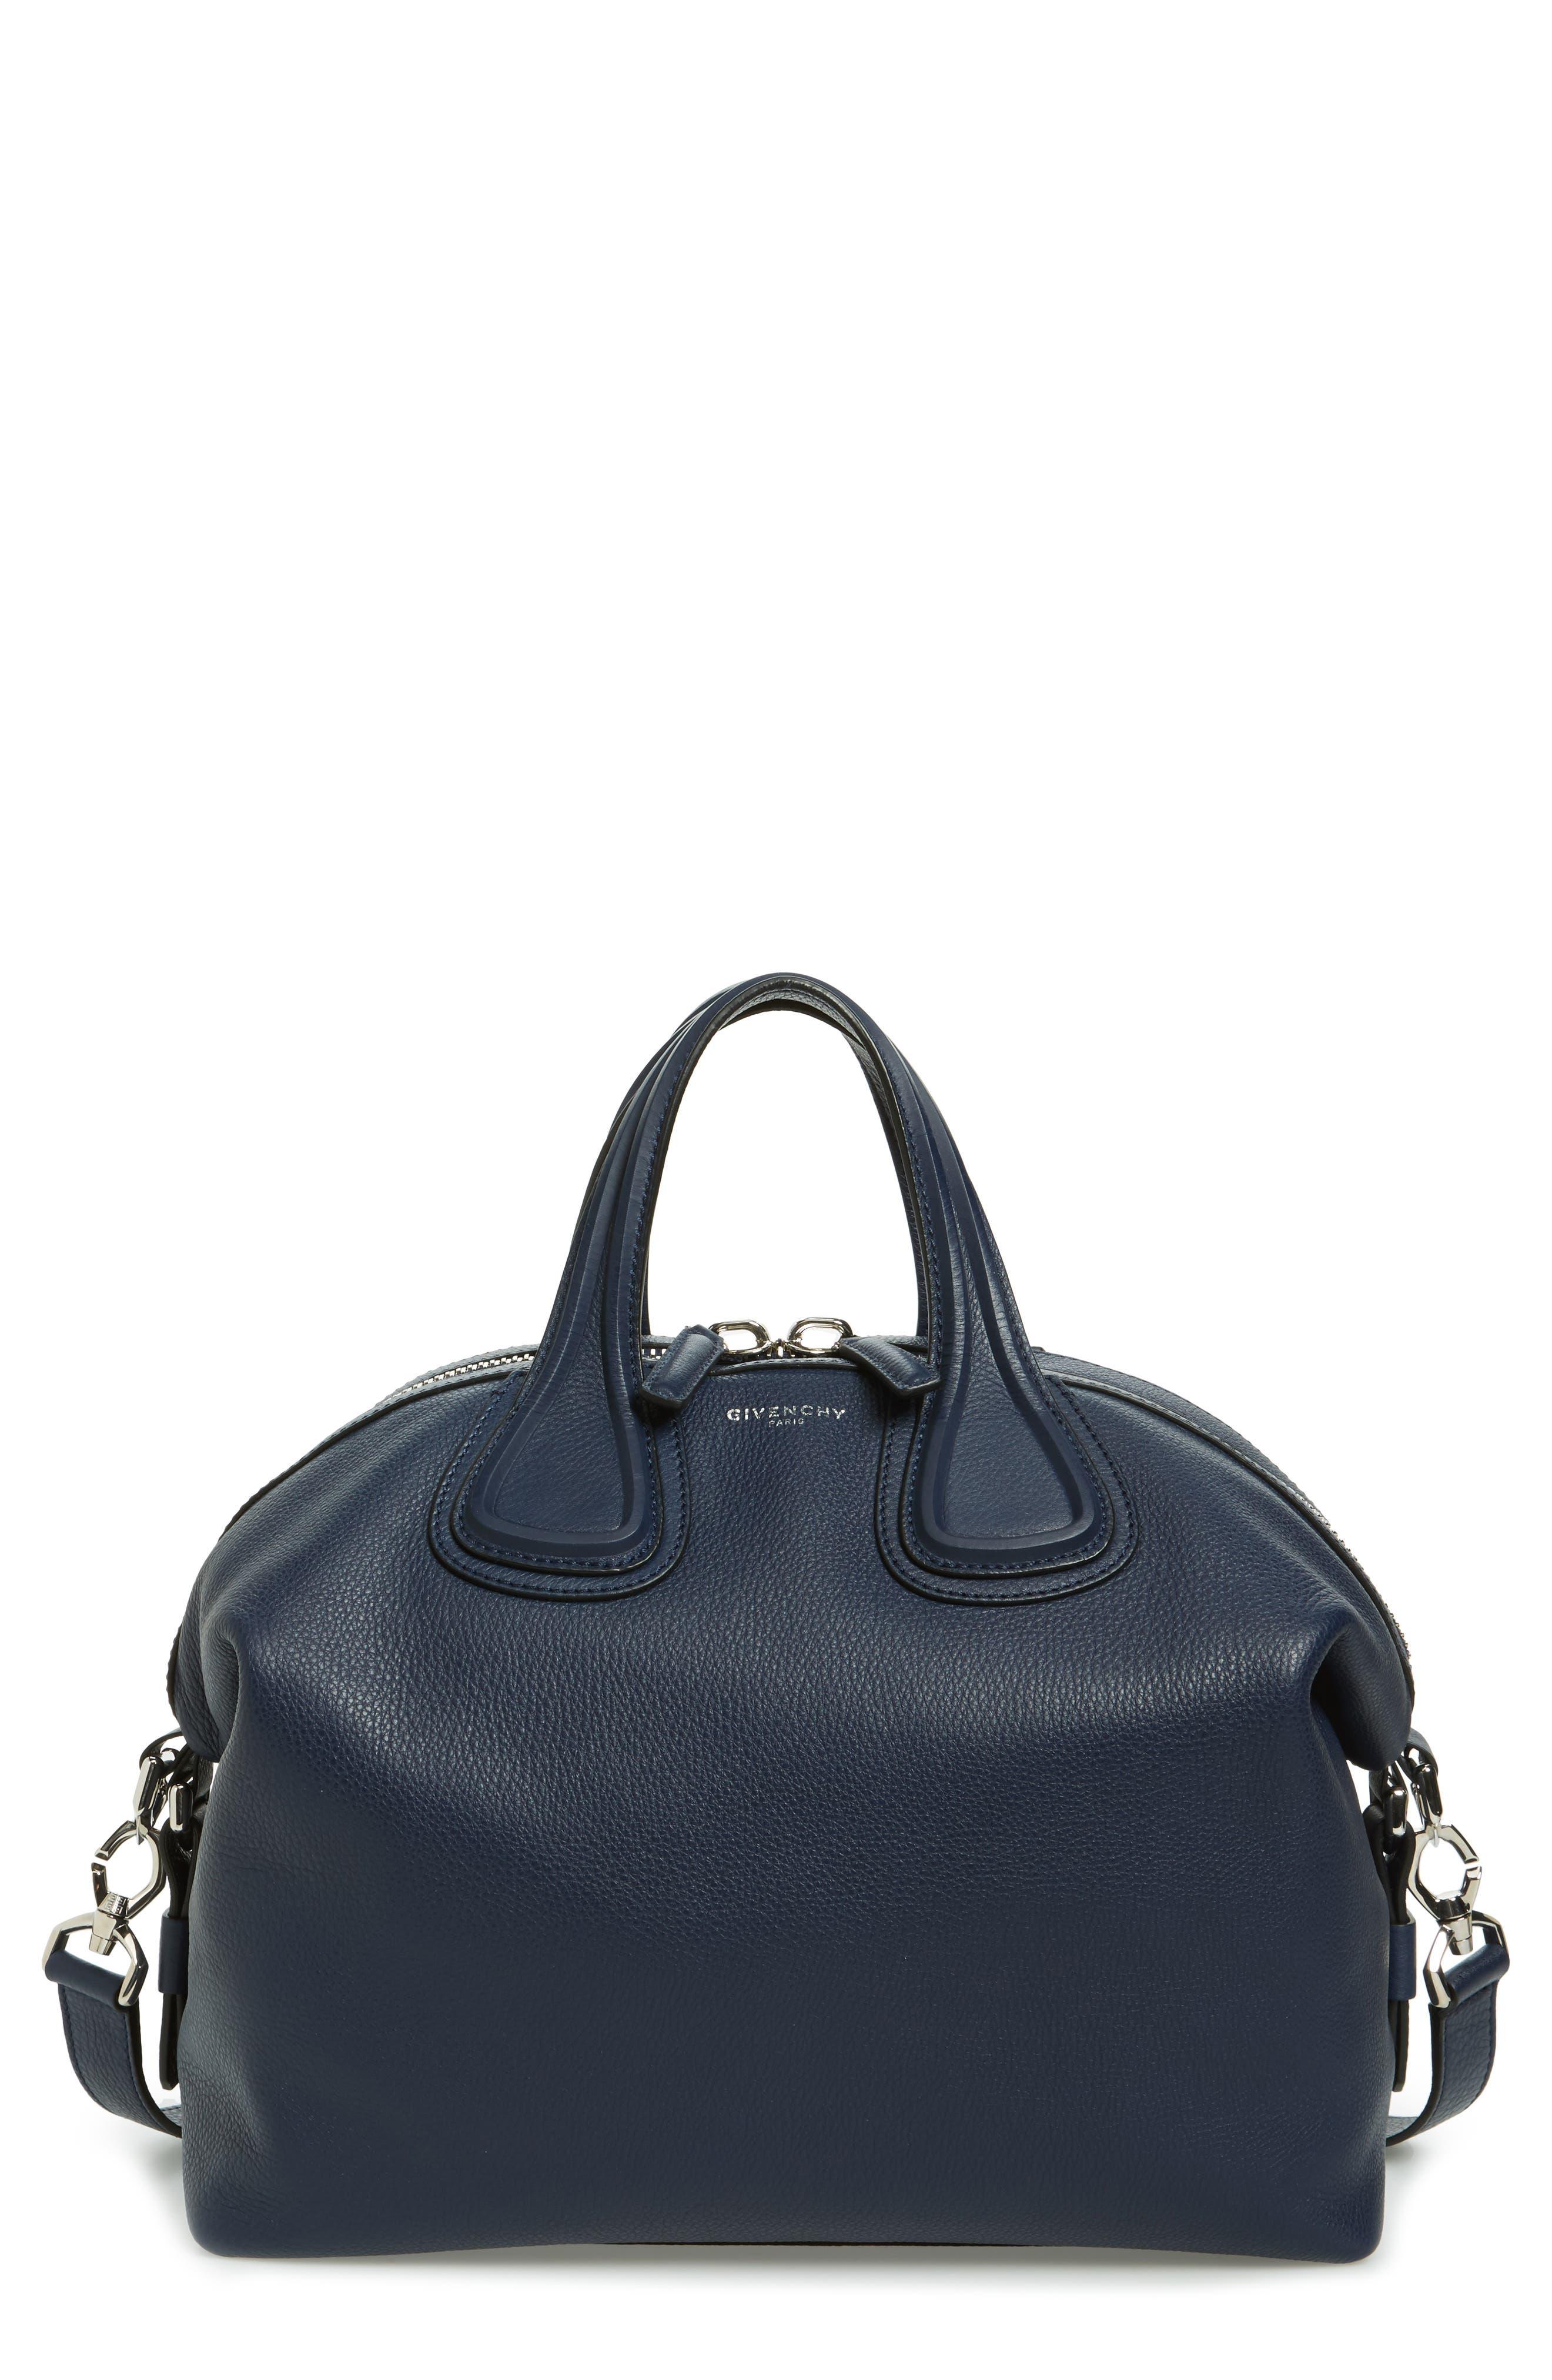 Givenchy 'Medium Nightingale' Calfskin Leather Satchel